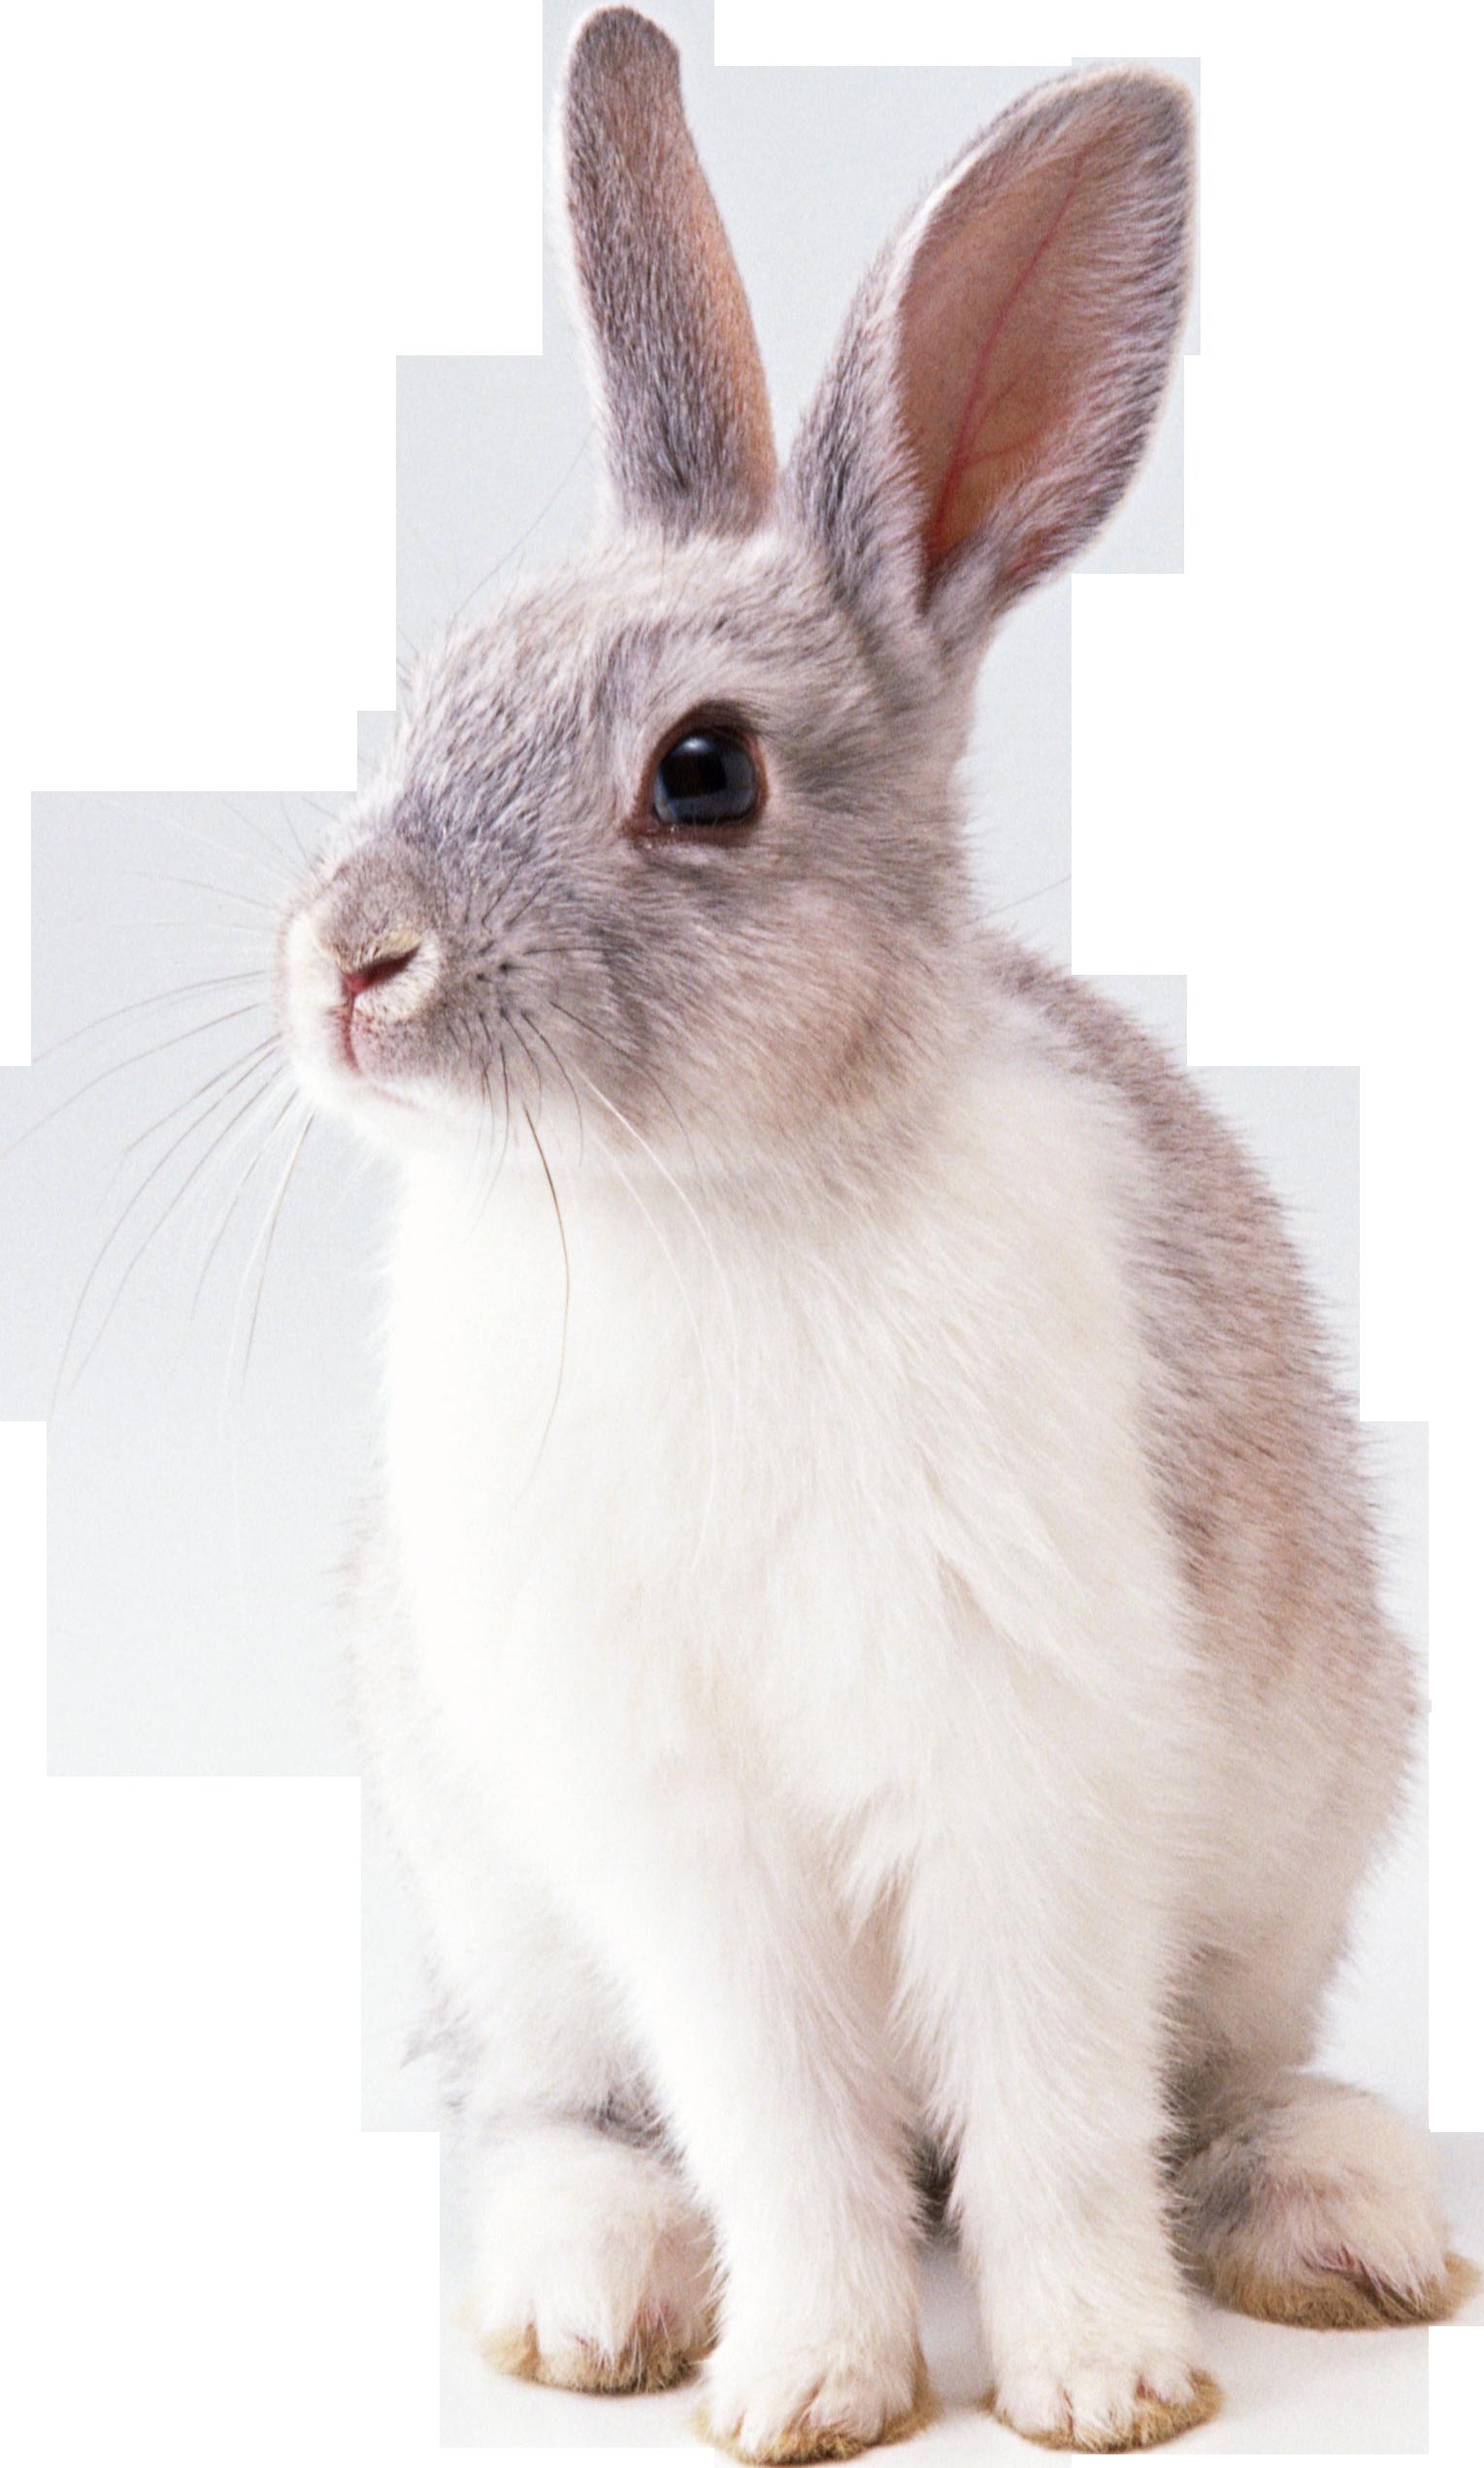 Rabbit PNG - 2859